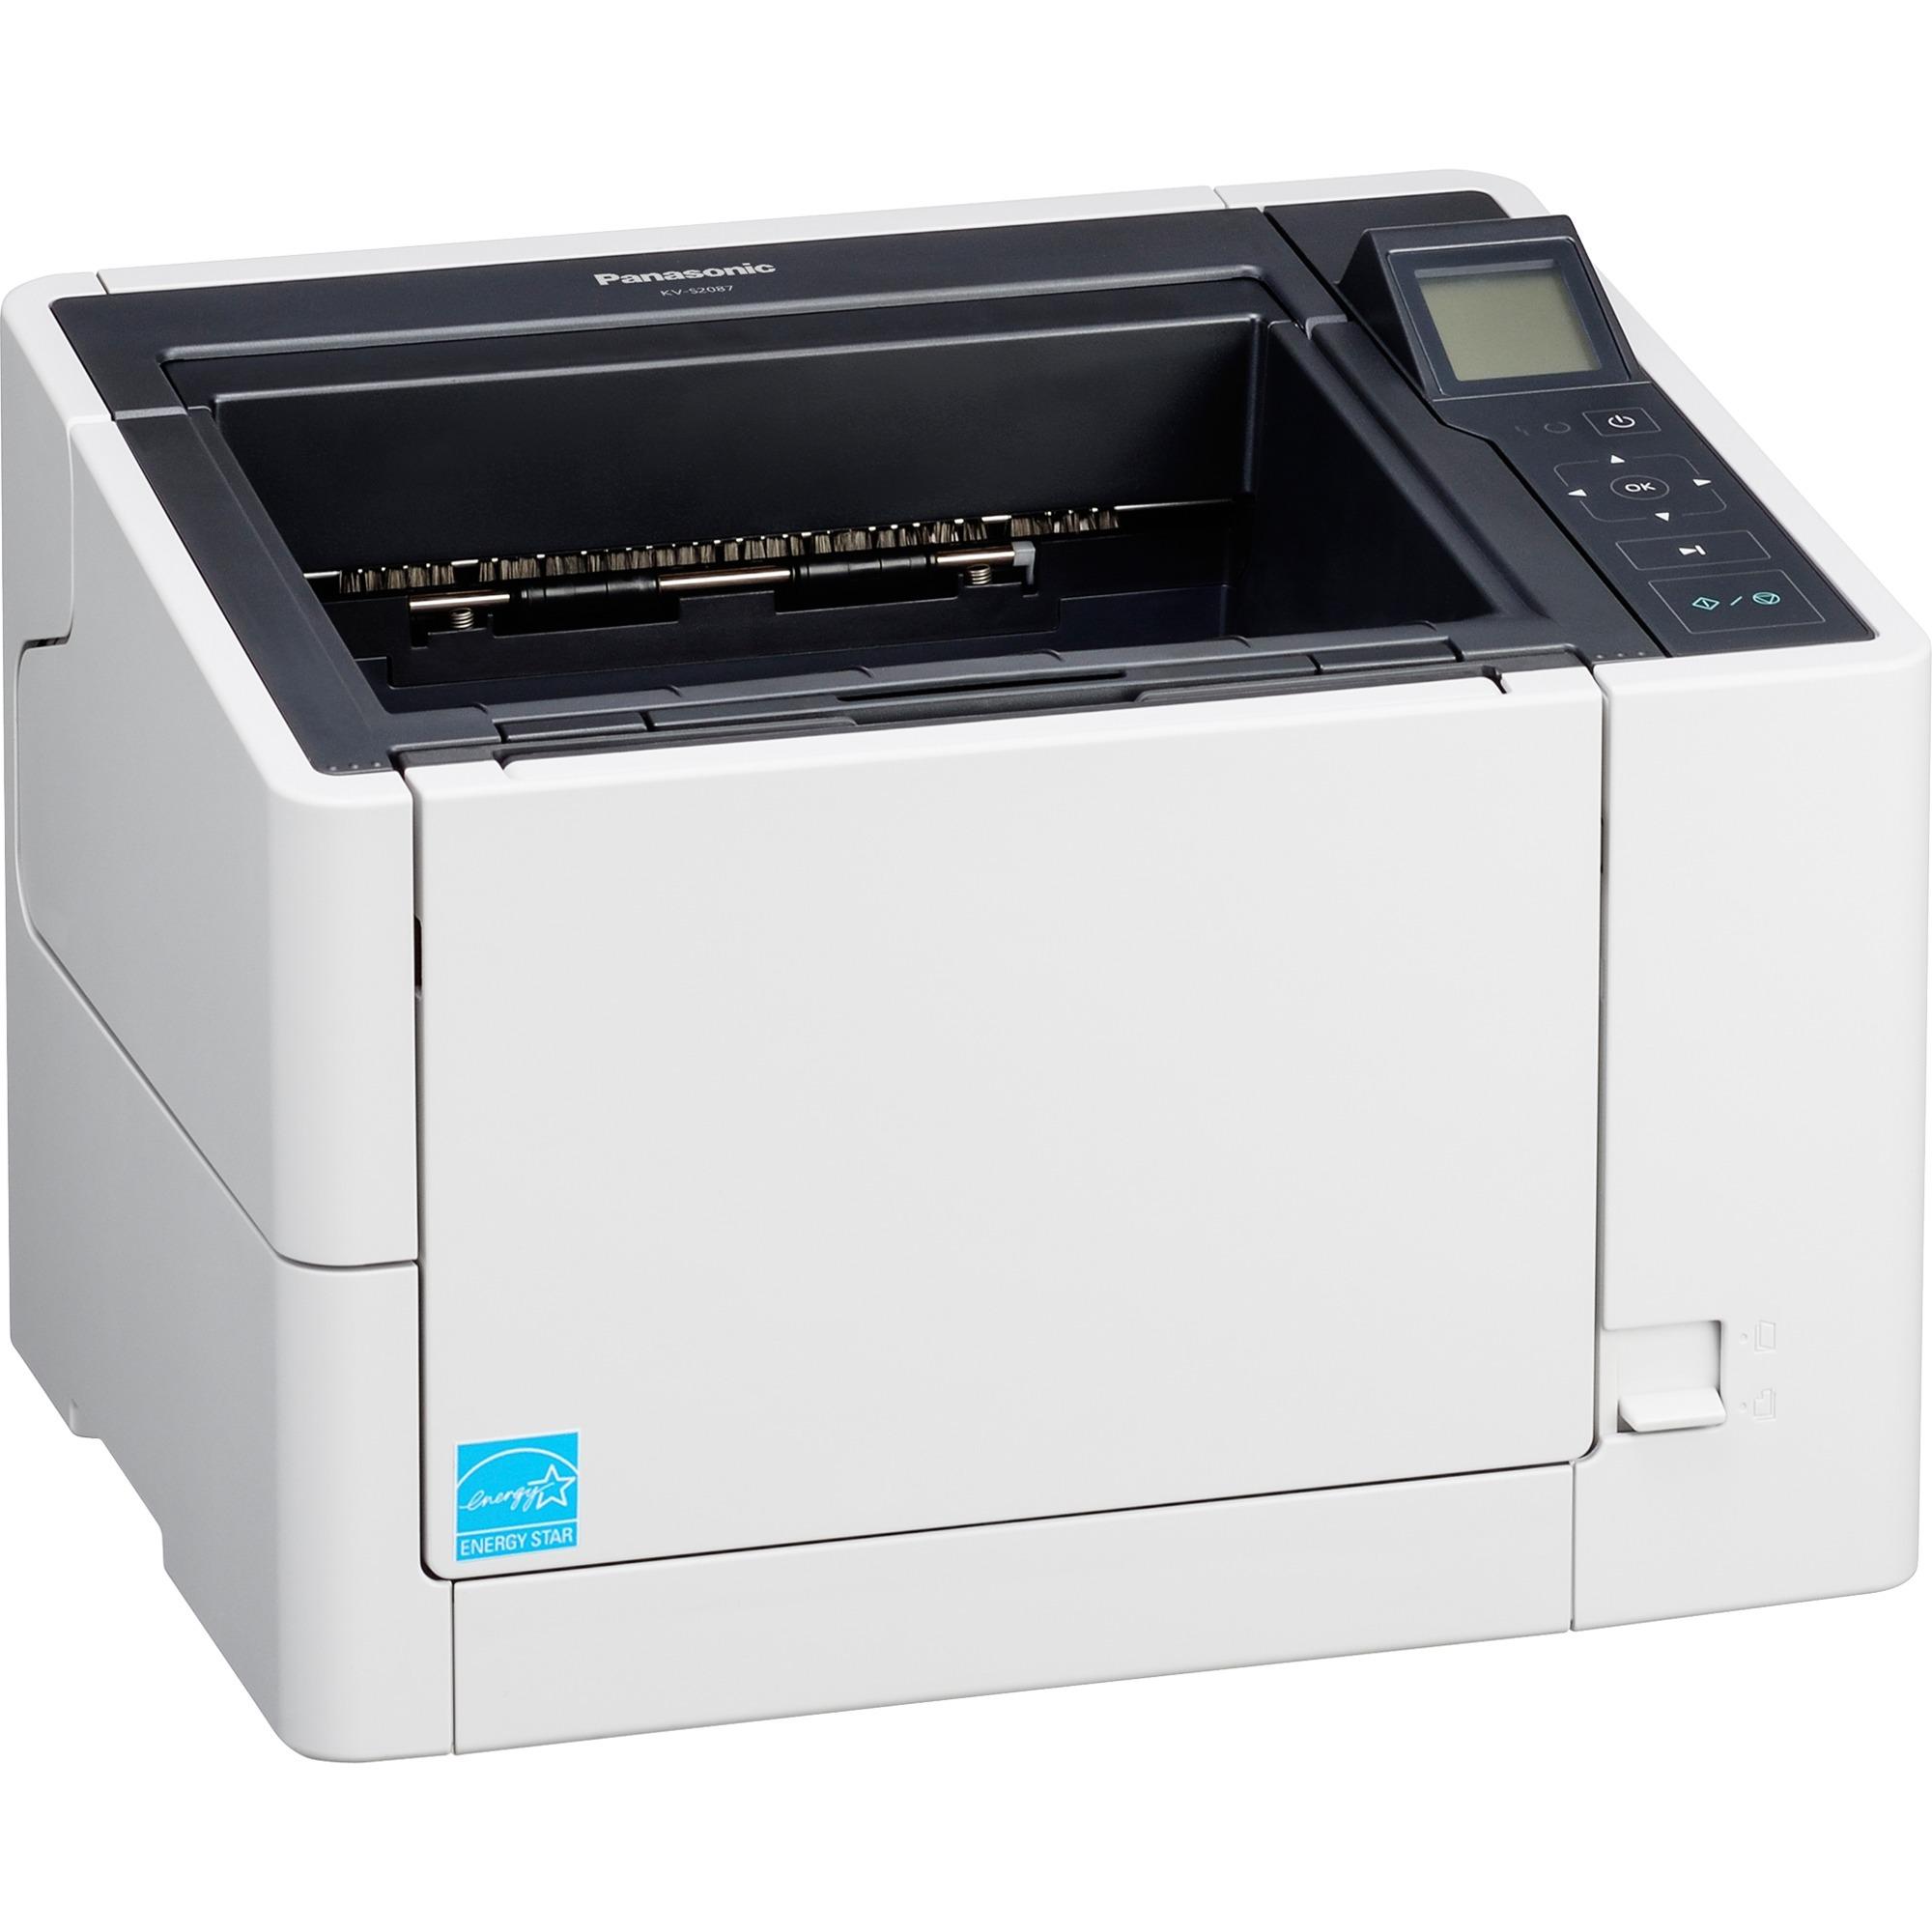 KV-S2087-U Scanner ADF 600 x 600DPI A4 Noir, Blanc scanner